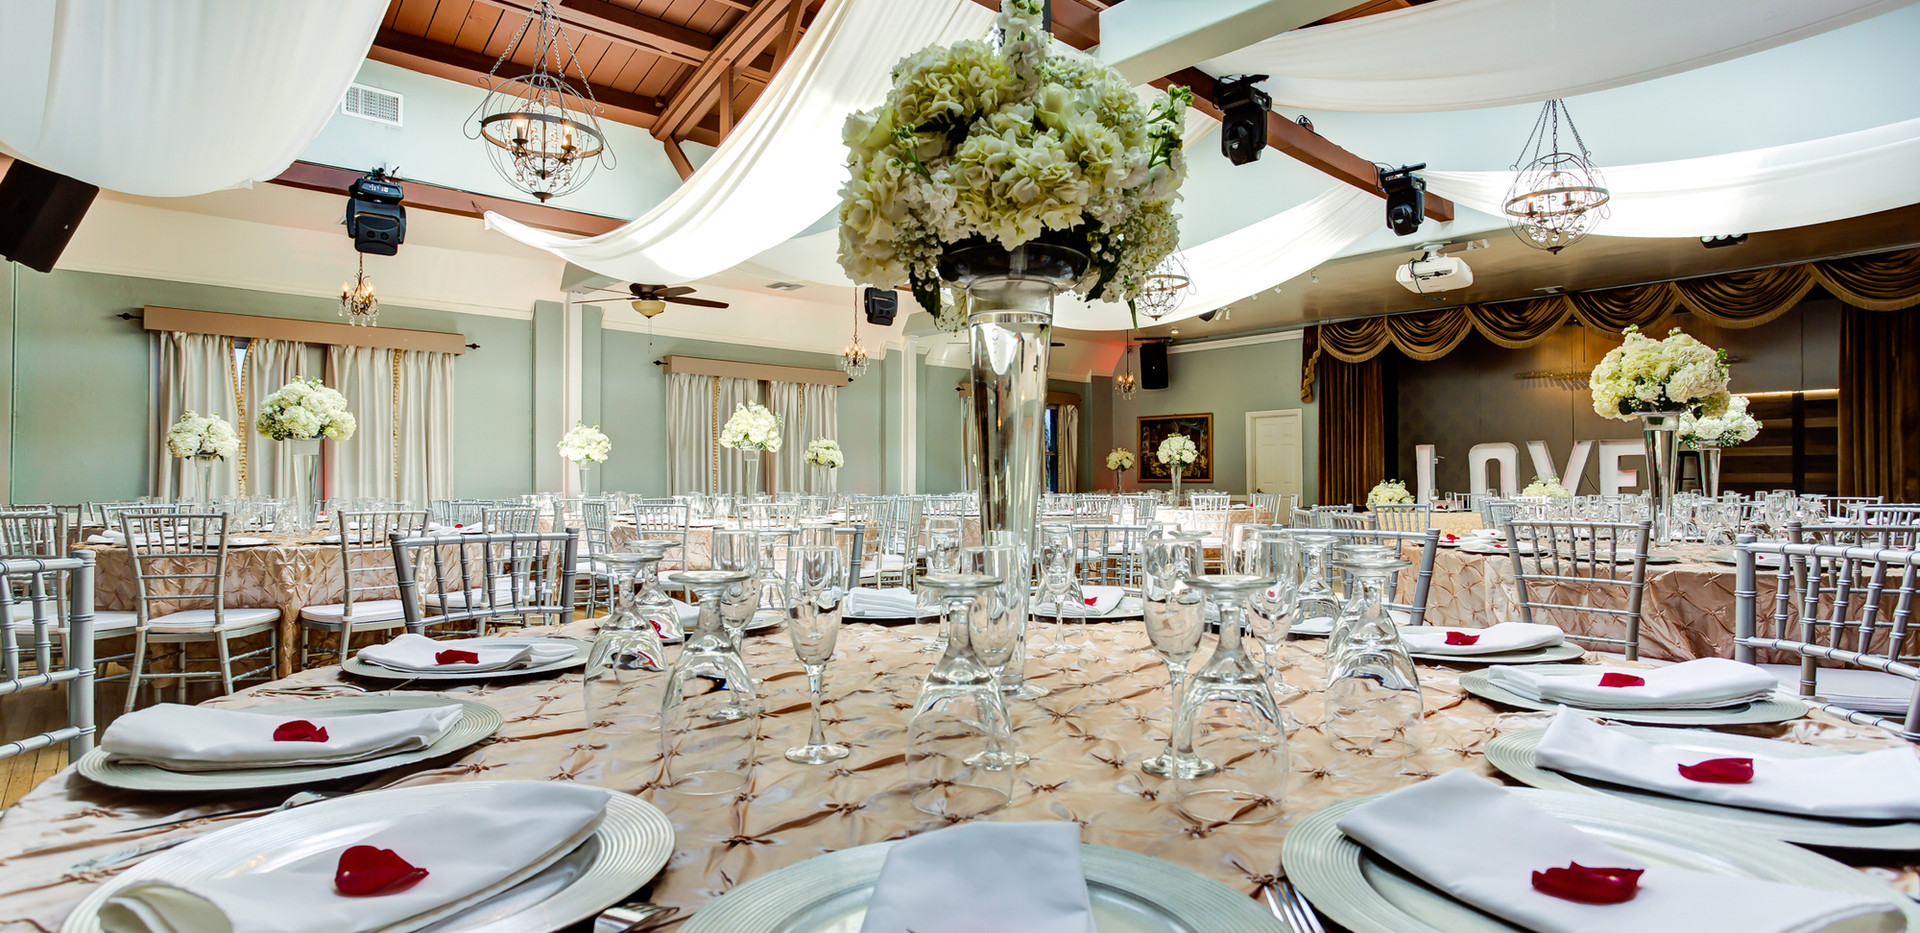 Atlantis Banquet Hall main room